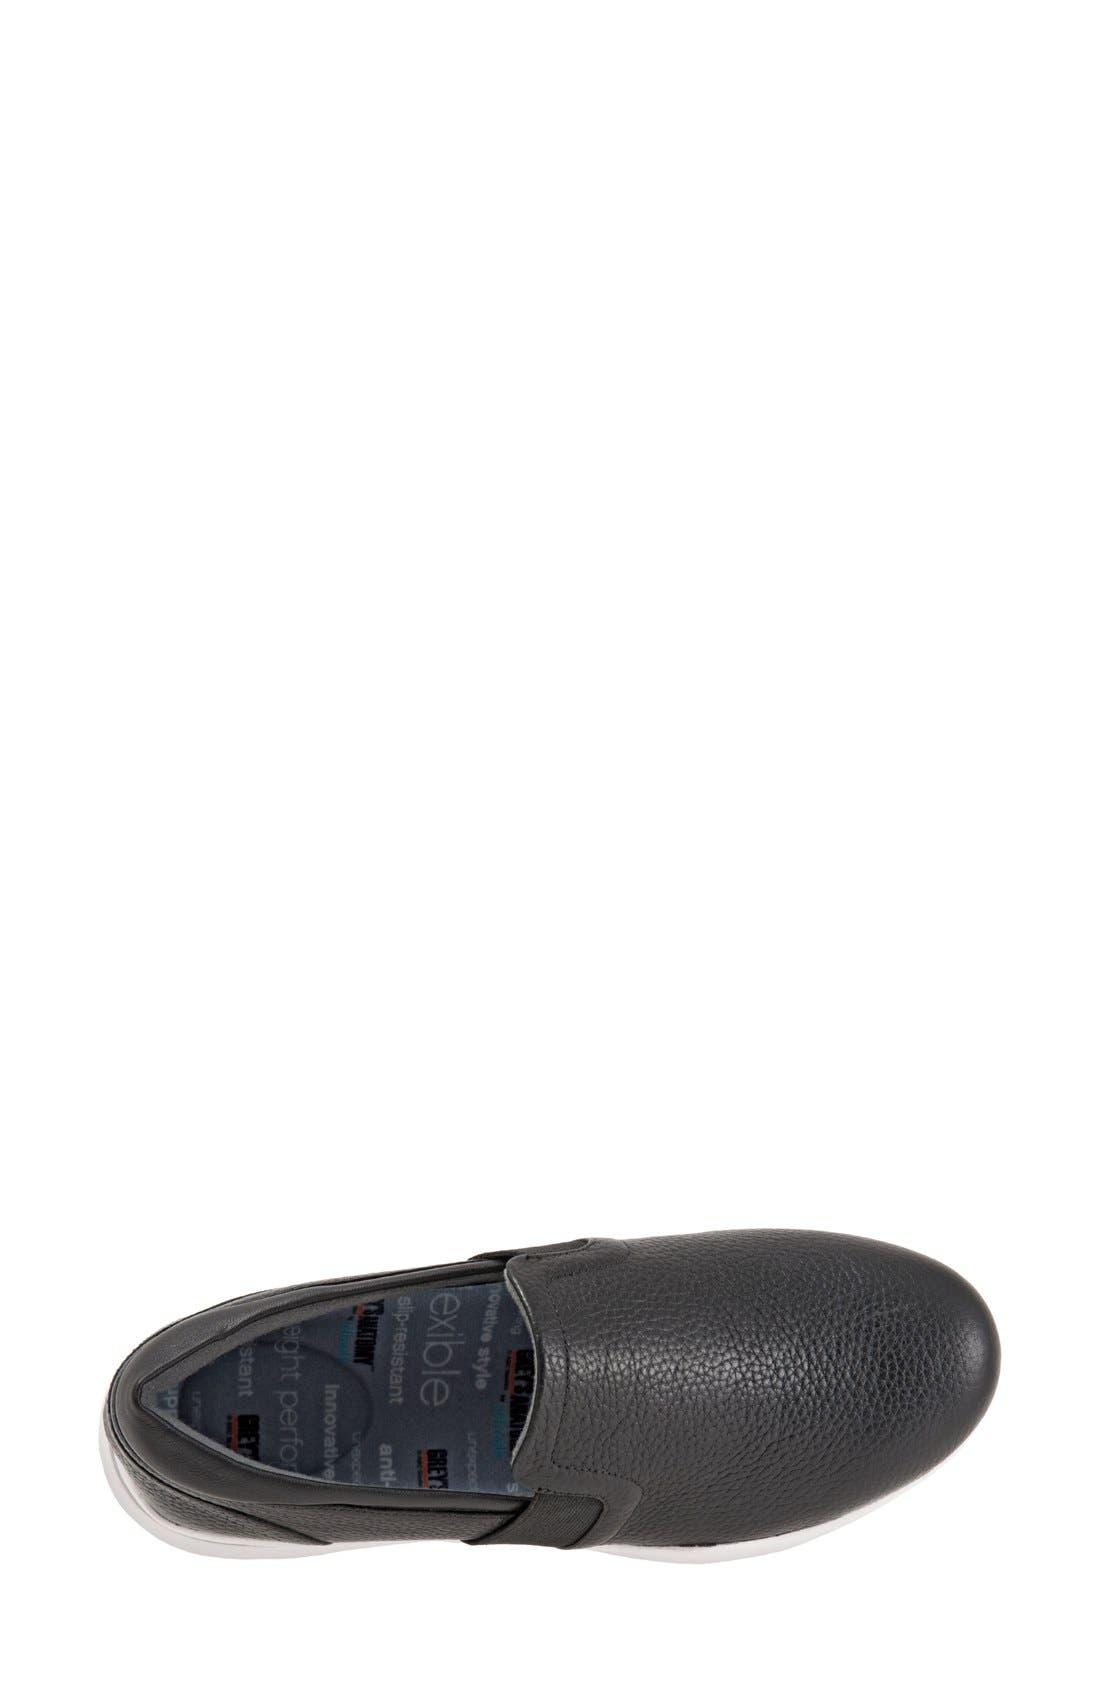 SOFTWALK<SUP>®</SUP>, 'Vantage' Slip-On Sneaker, Alternate thumbnail 3, color, BLACK / WHITE LEATHER